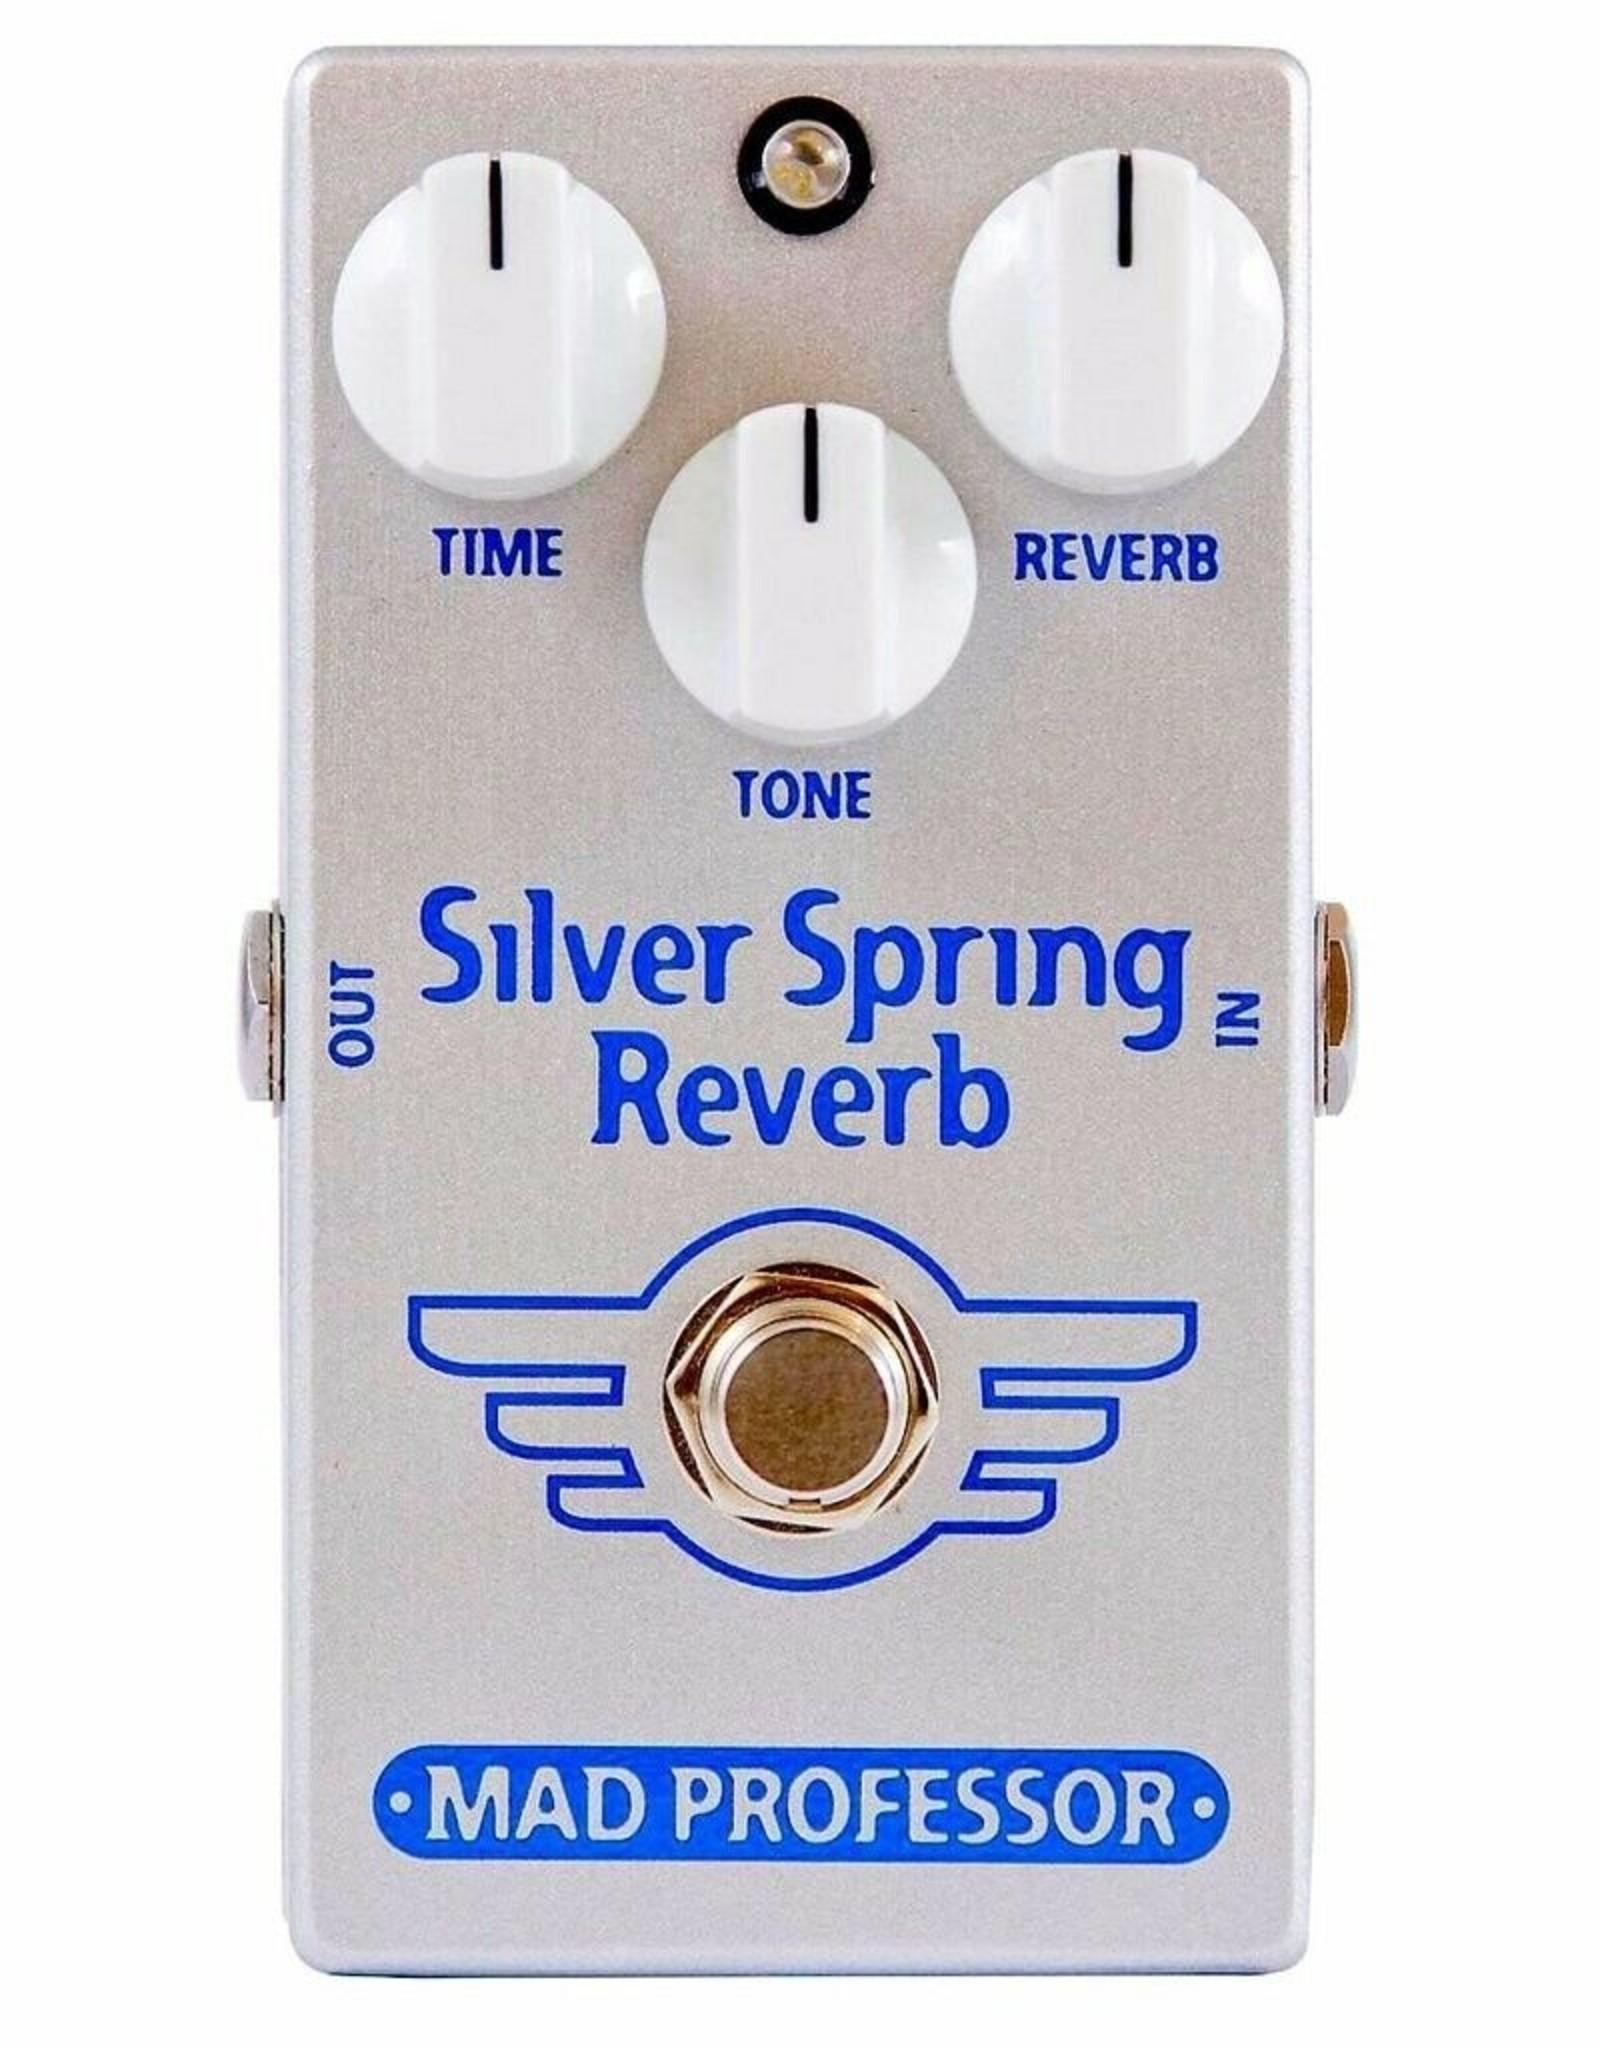 Mad Professor Silver Spring Reverb Pedal